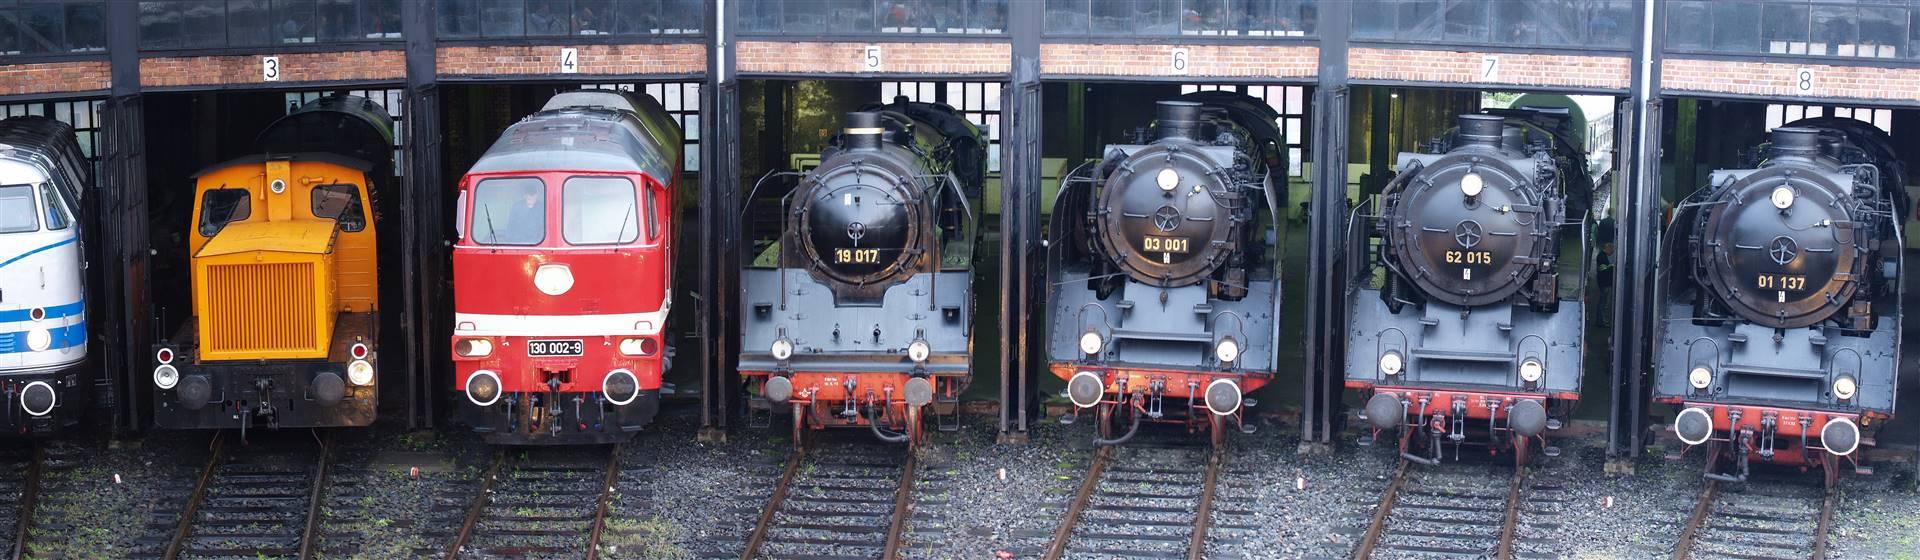 "<img src=""dresden-adobestock_26955602.jpeg"" alt=""Dresden Steam Festival""/>"